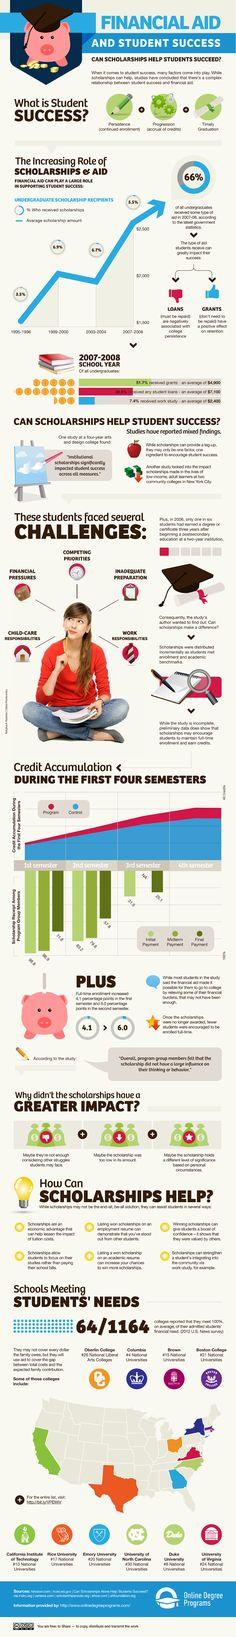 Infographic: Financial Aid & Student Success - jodi@collegefinancialaidadvisors.com - College Financial Aid Advisors Mail